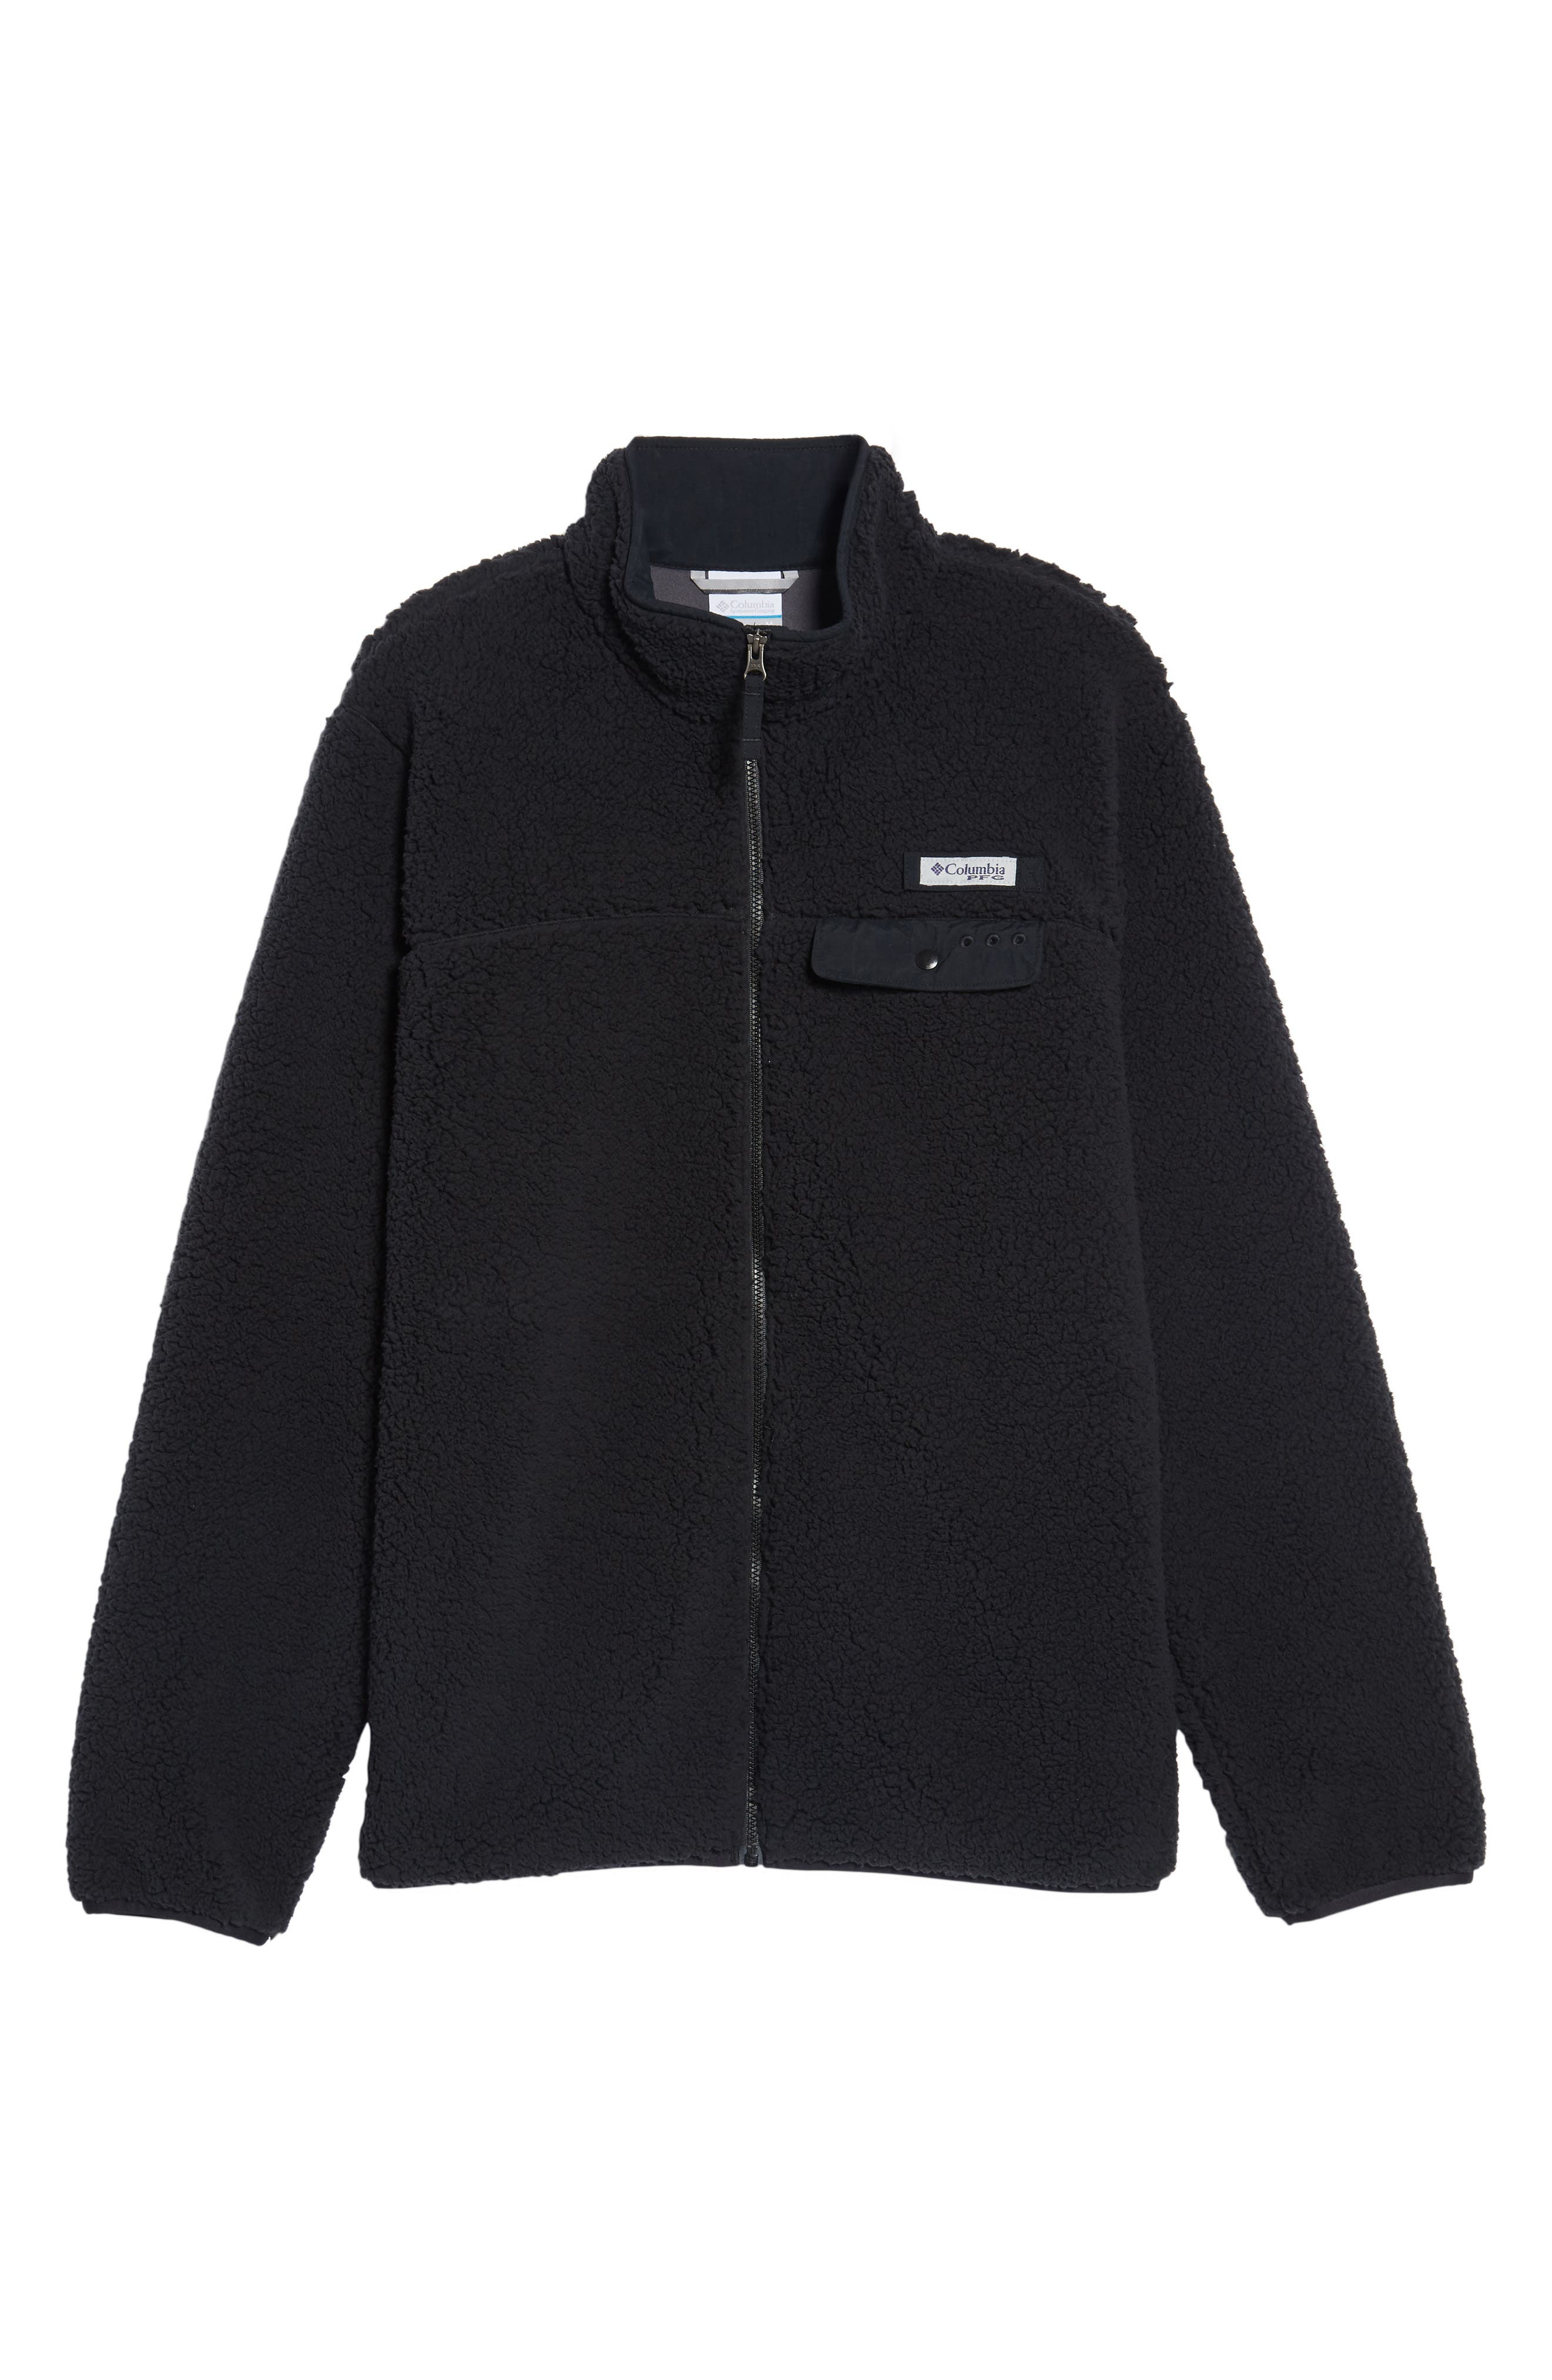 Harborside Fleece Jacket,                             Alternate thumbnail 21, color,